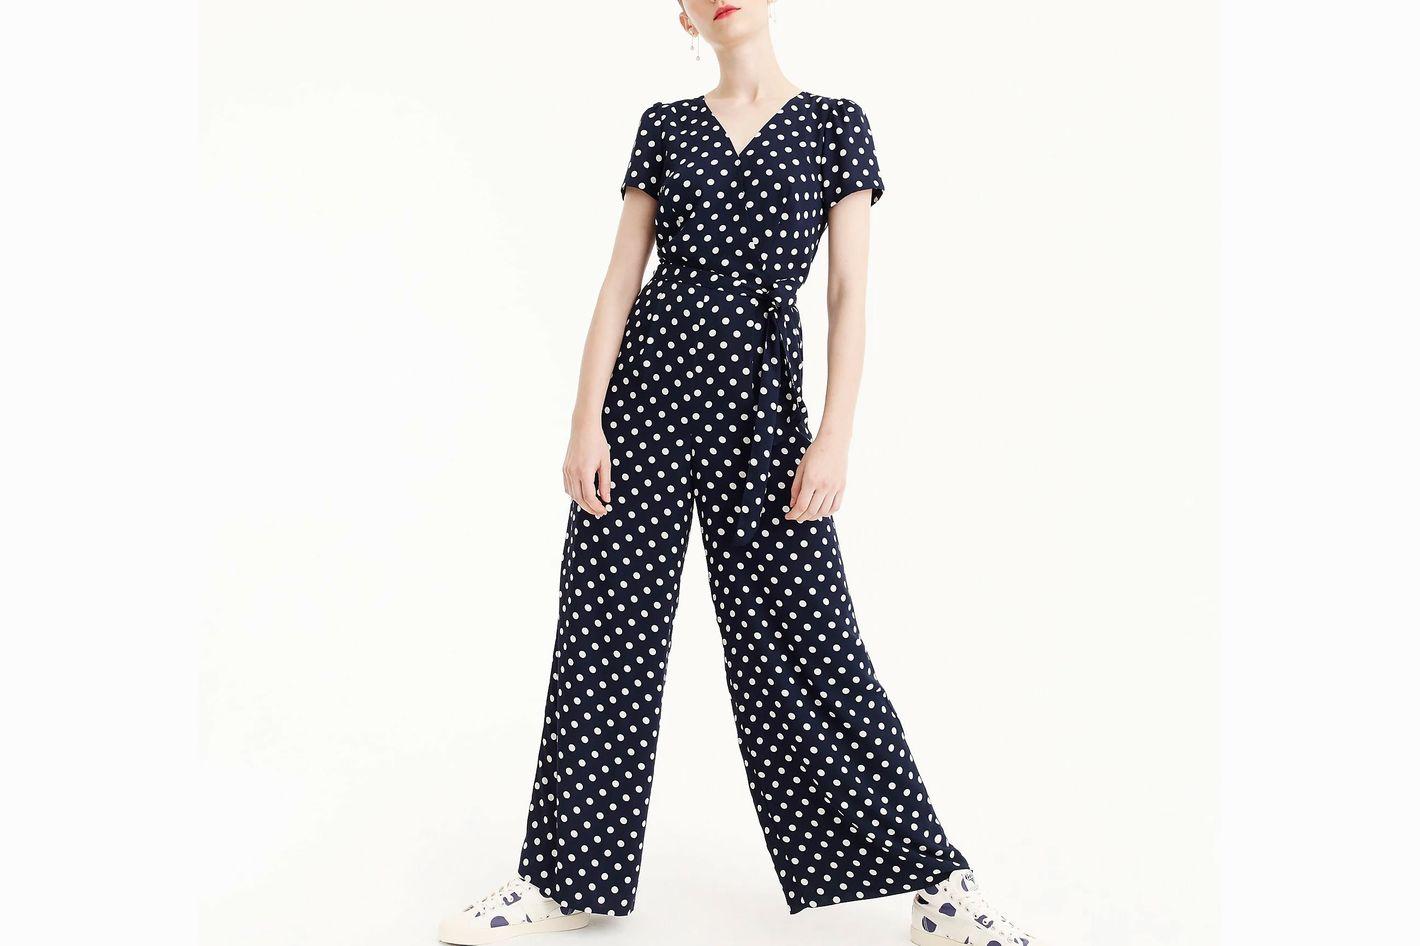 Short-Sleeve Wrap Jumpsuit In Polka Dot